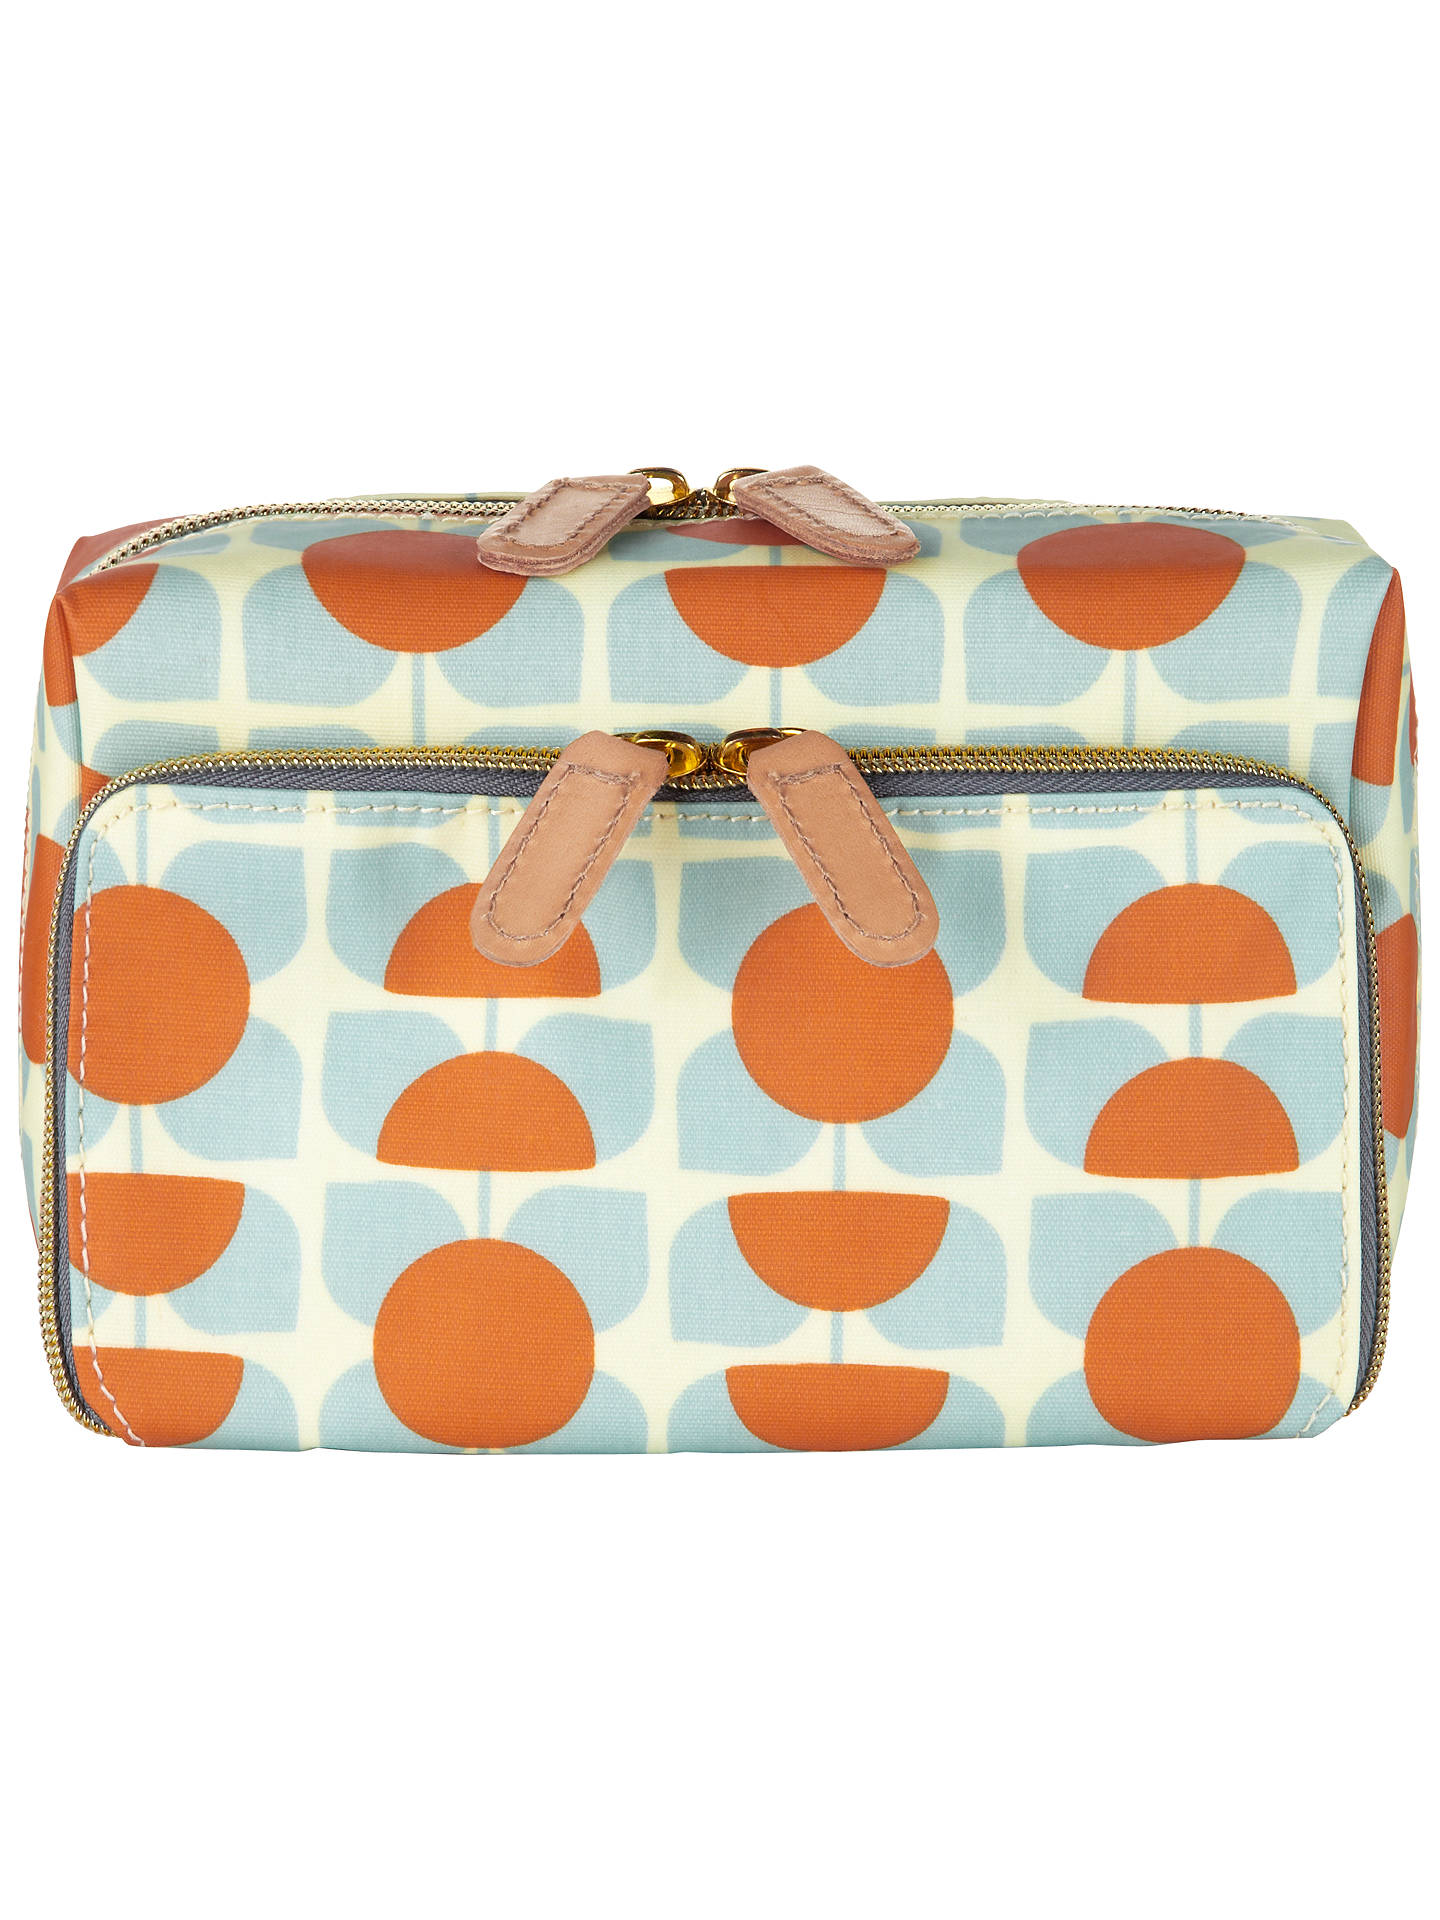 Orla Kiely Square Flower Orange Blue Wash Bag At John